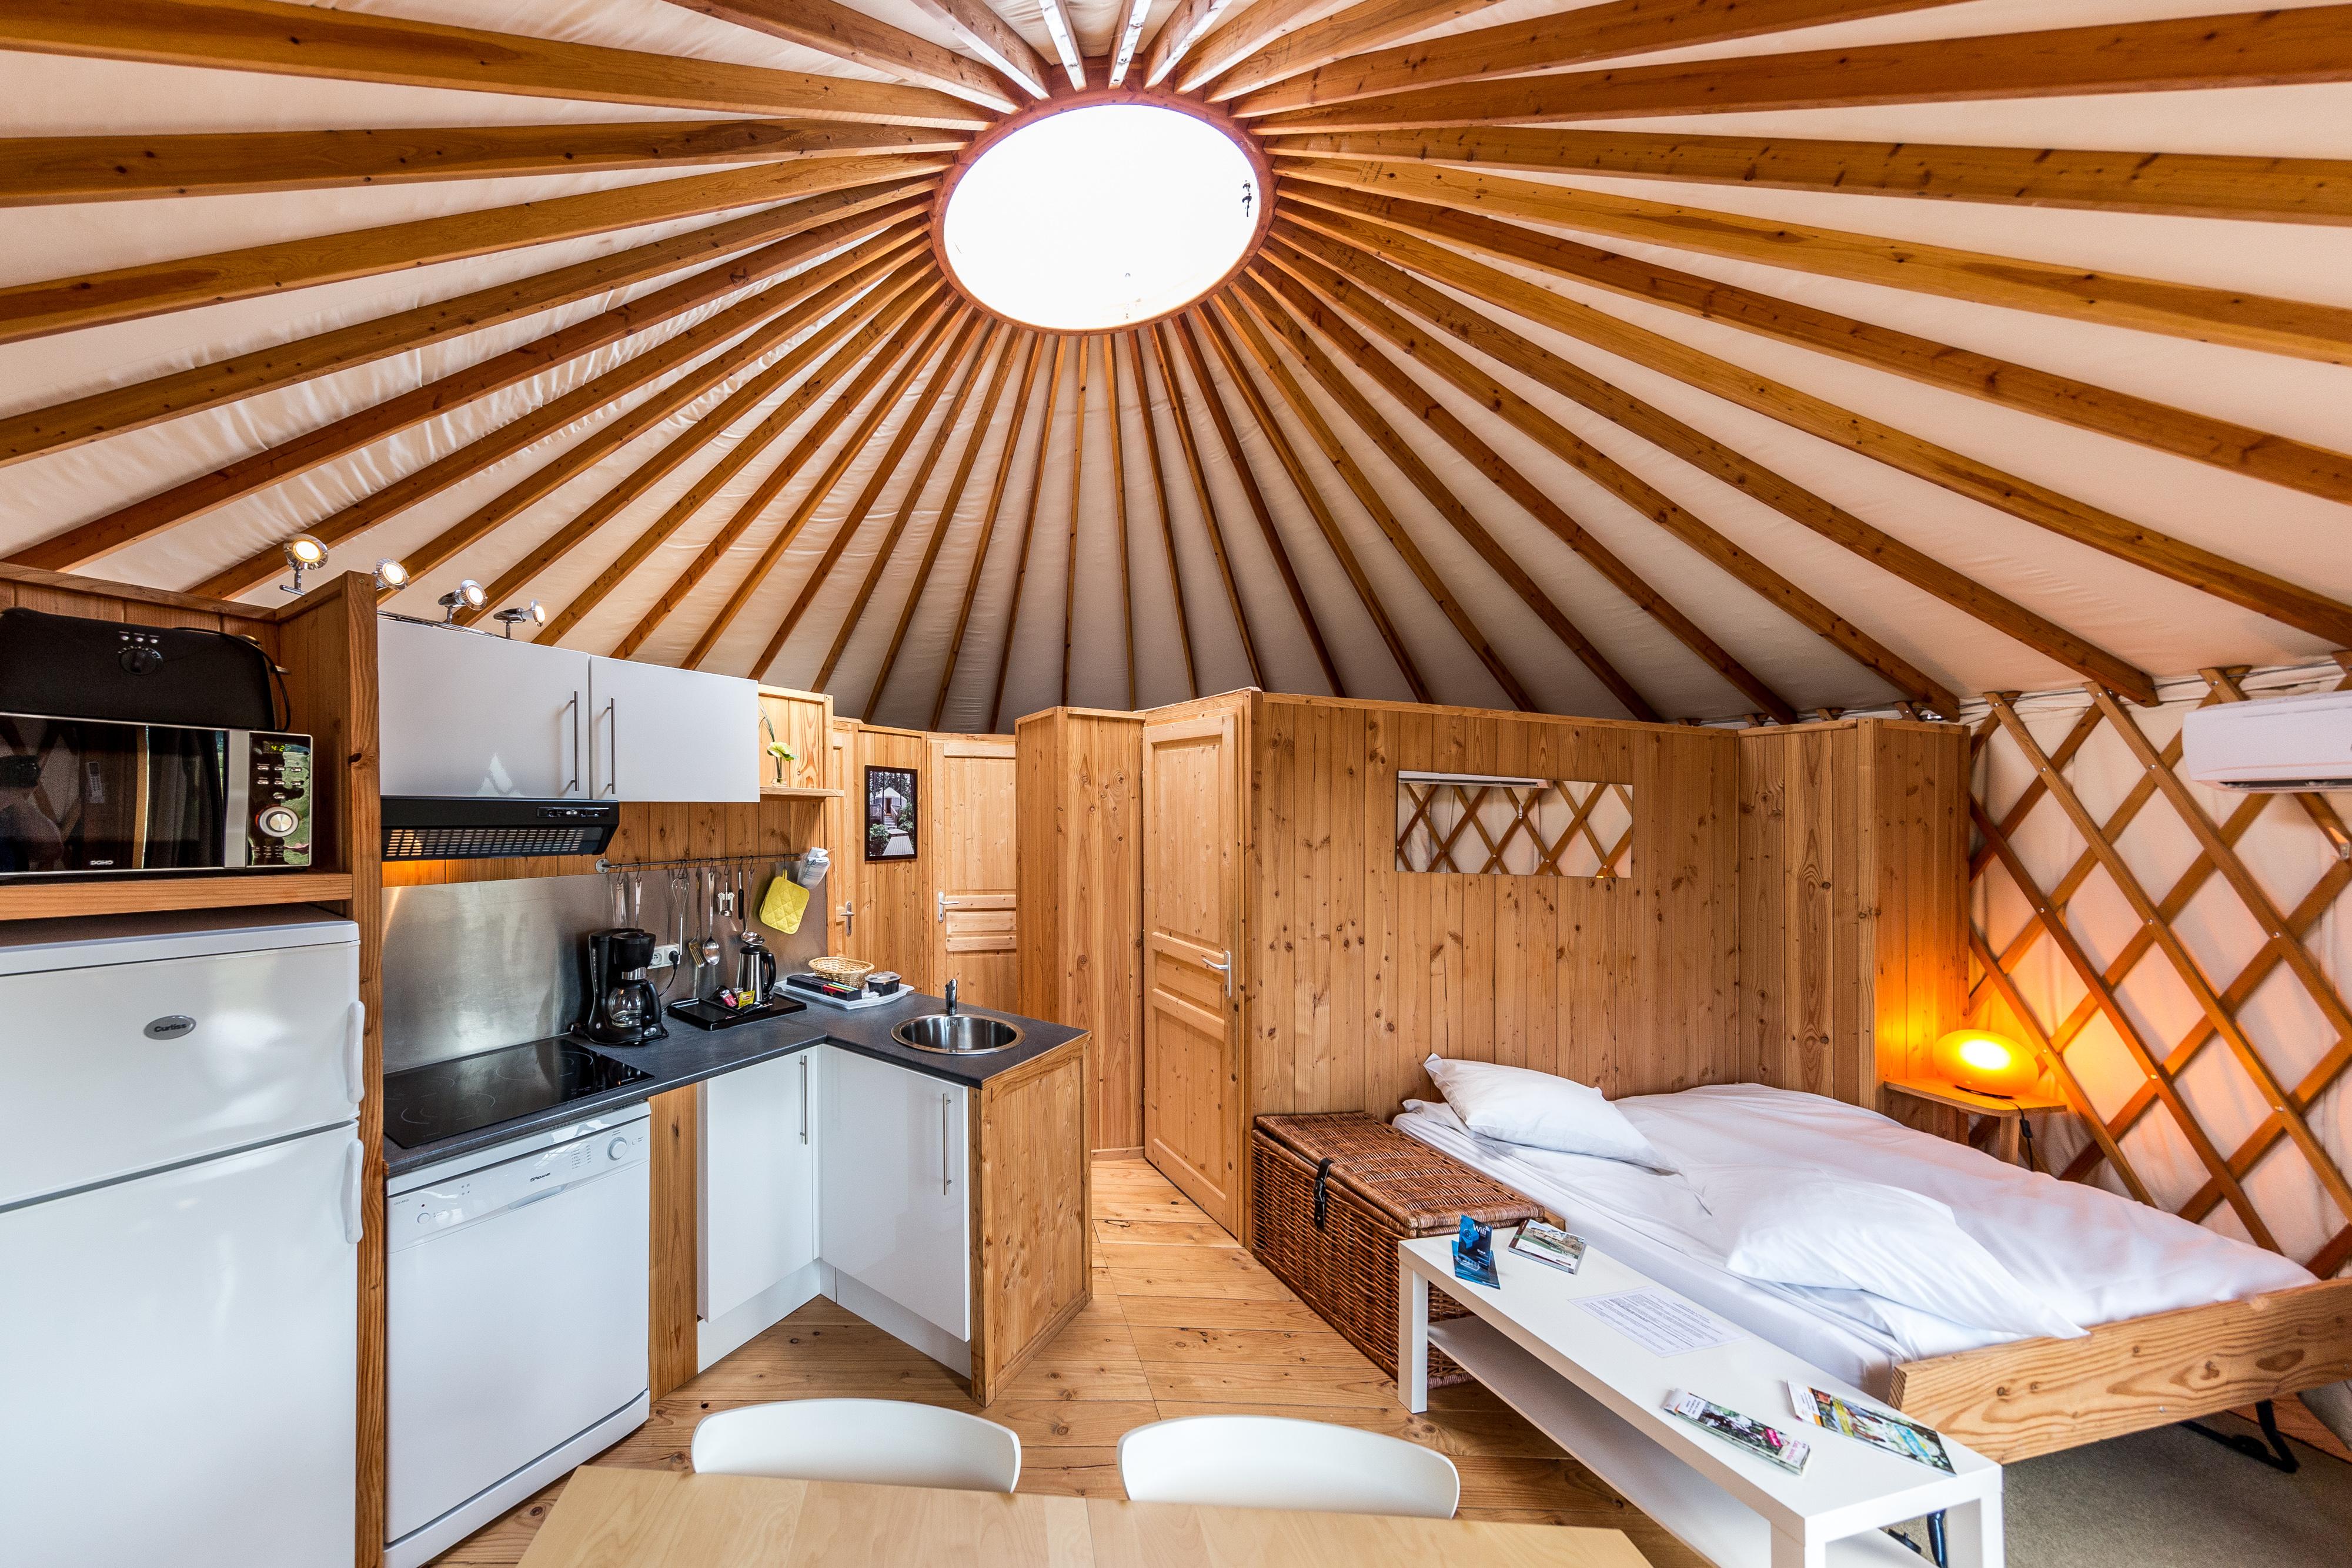 H bergement en yourte en auvergne allier for Maison yourte moderne